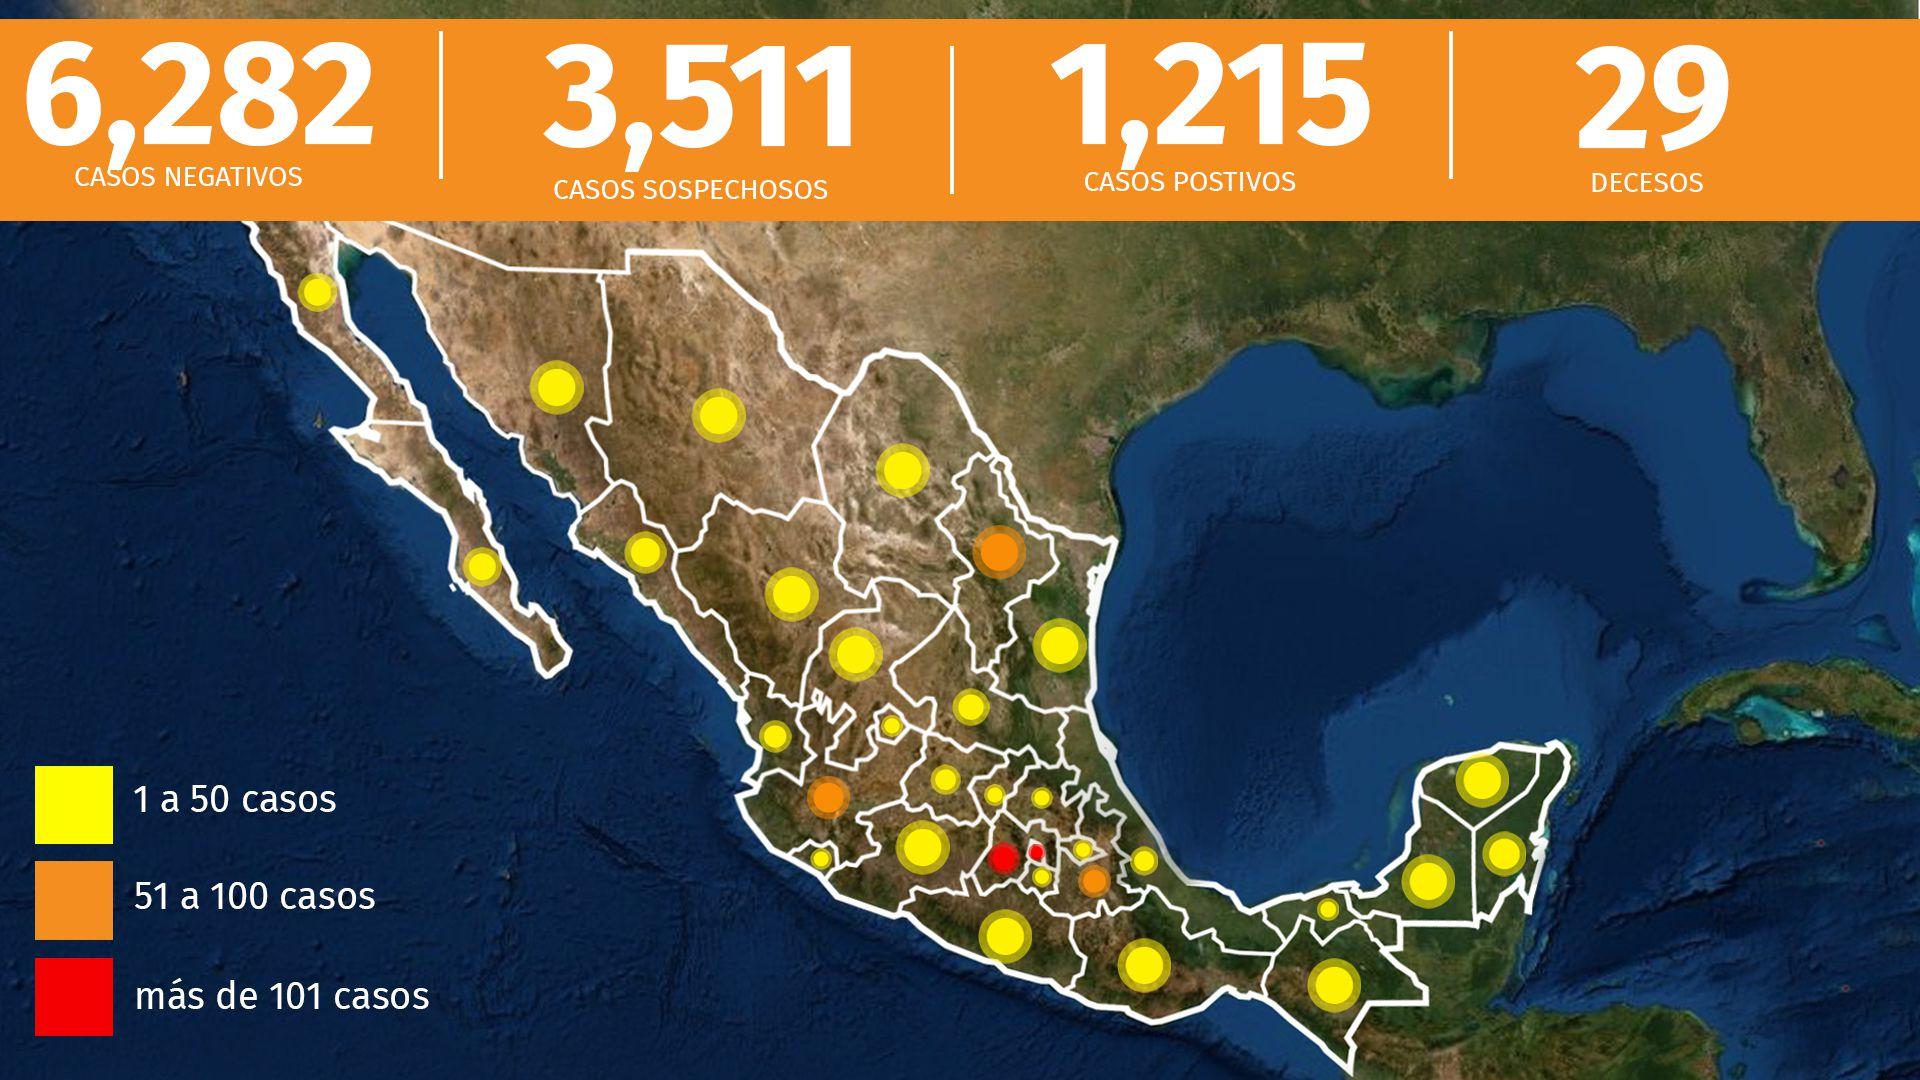 Reporte de contagio por coronavirus este 31 de marzo (Foto: Infobae)